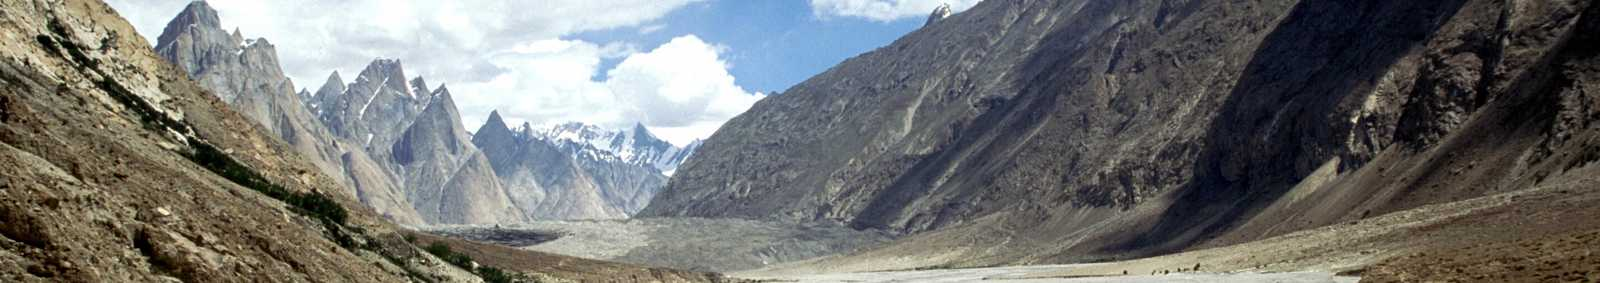 The Best Treks in Pakistan